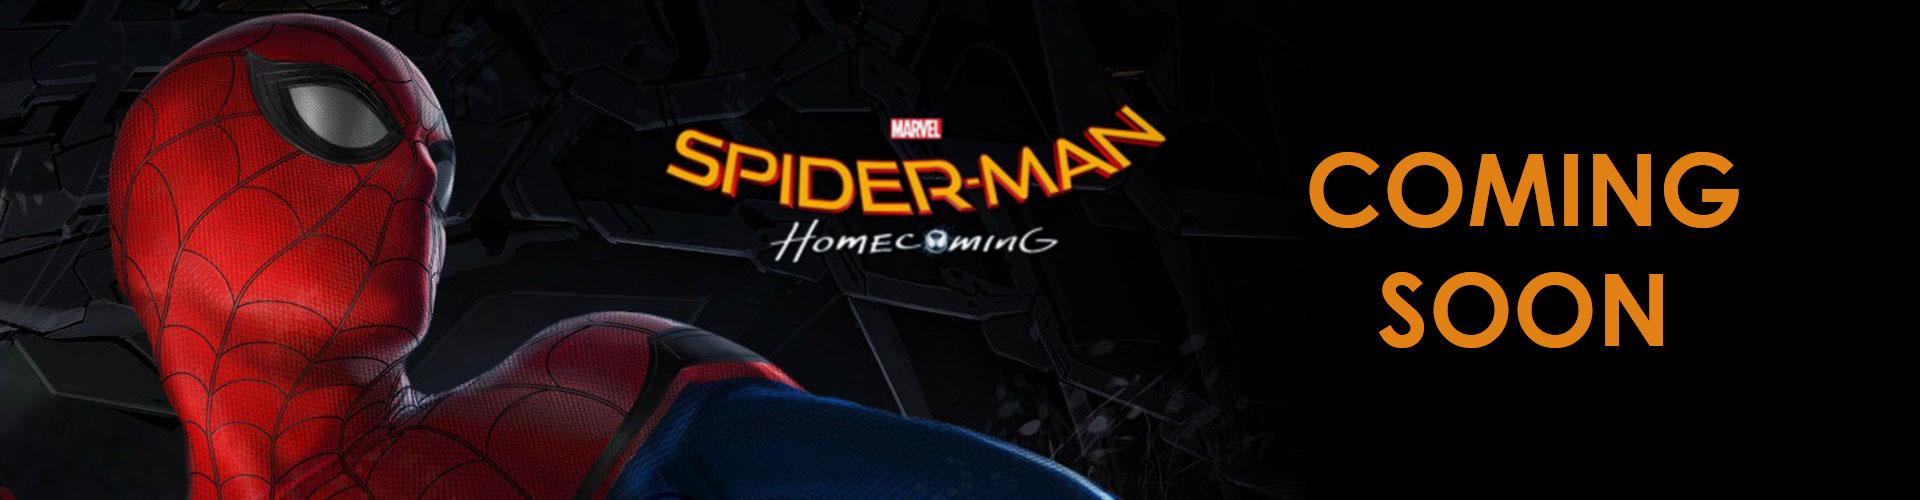 spiderman-coming-soon